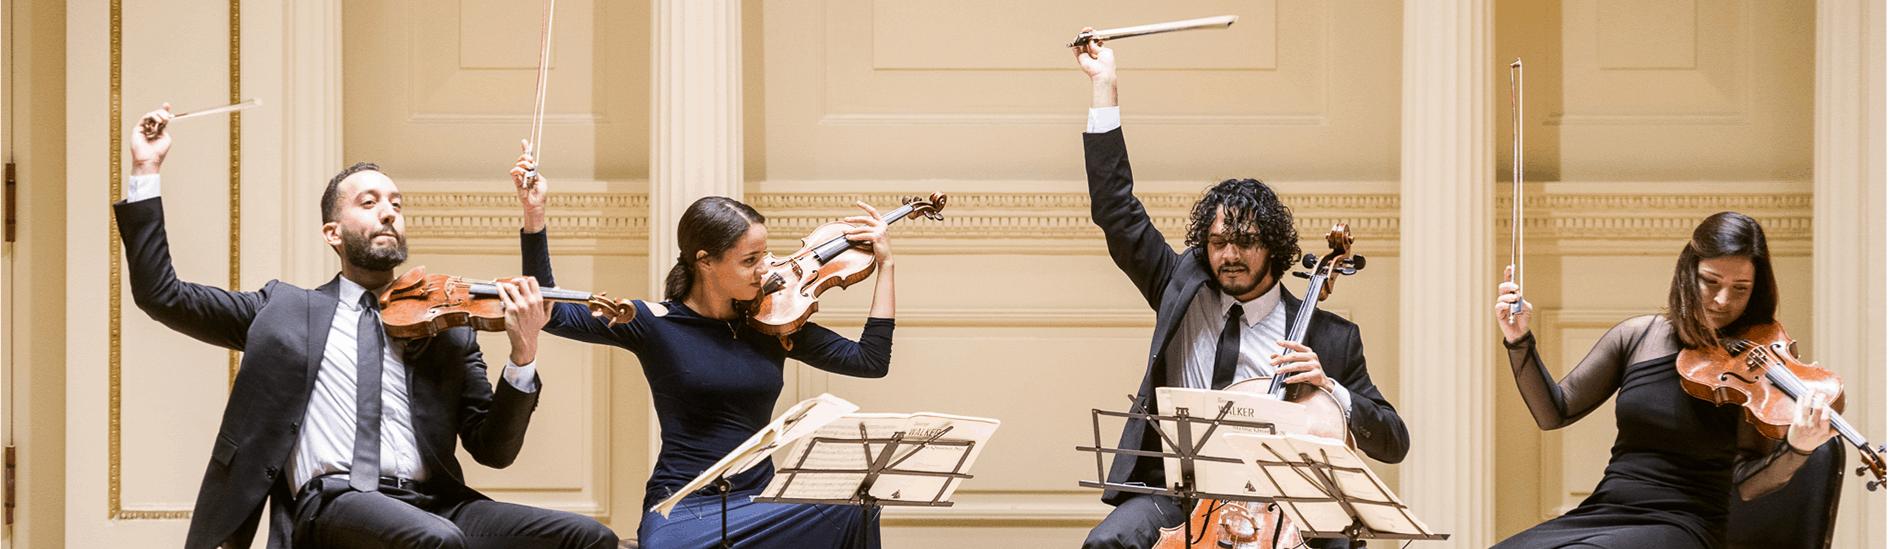 APAP NYC 2020 YPCA Participants, Ivalas Quartet, by Adam Kissick/APAP